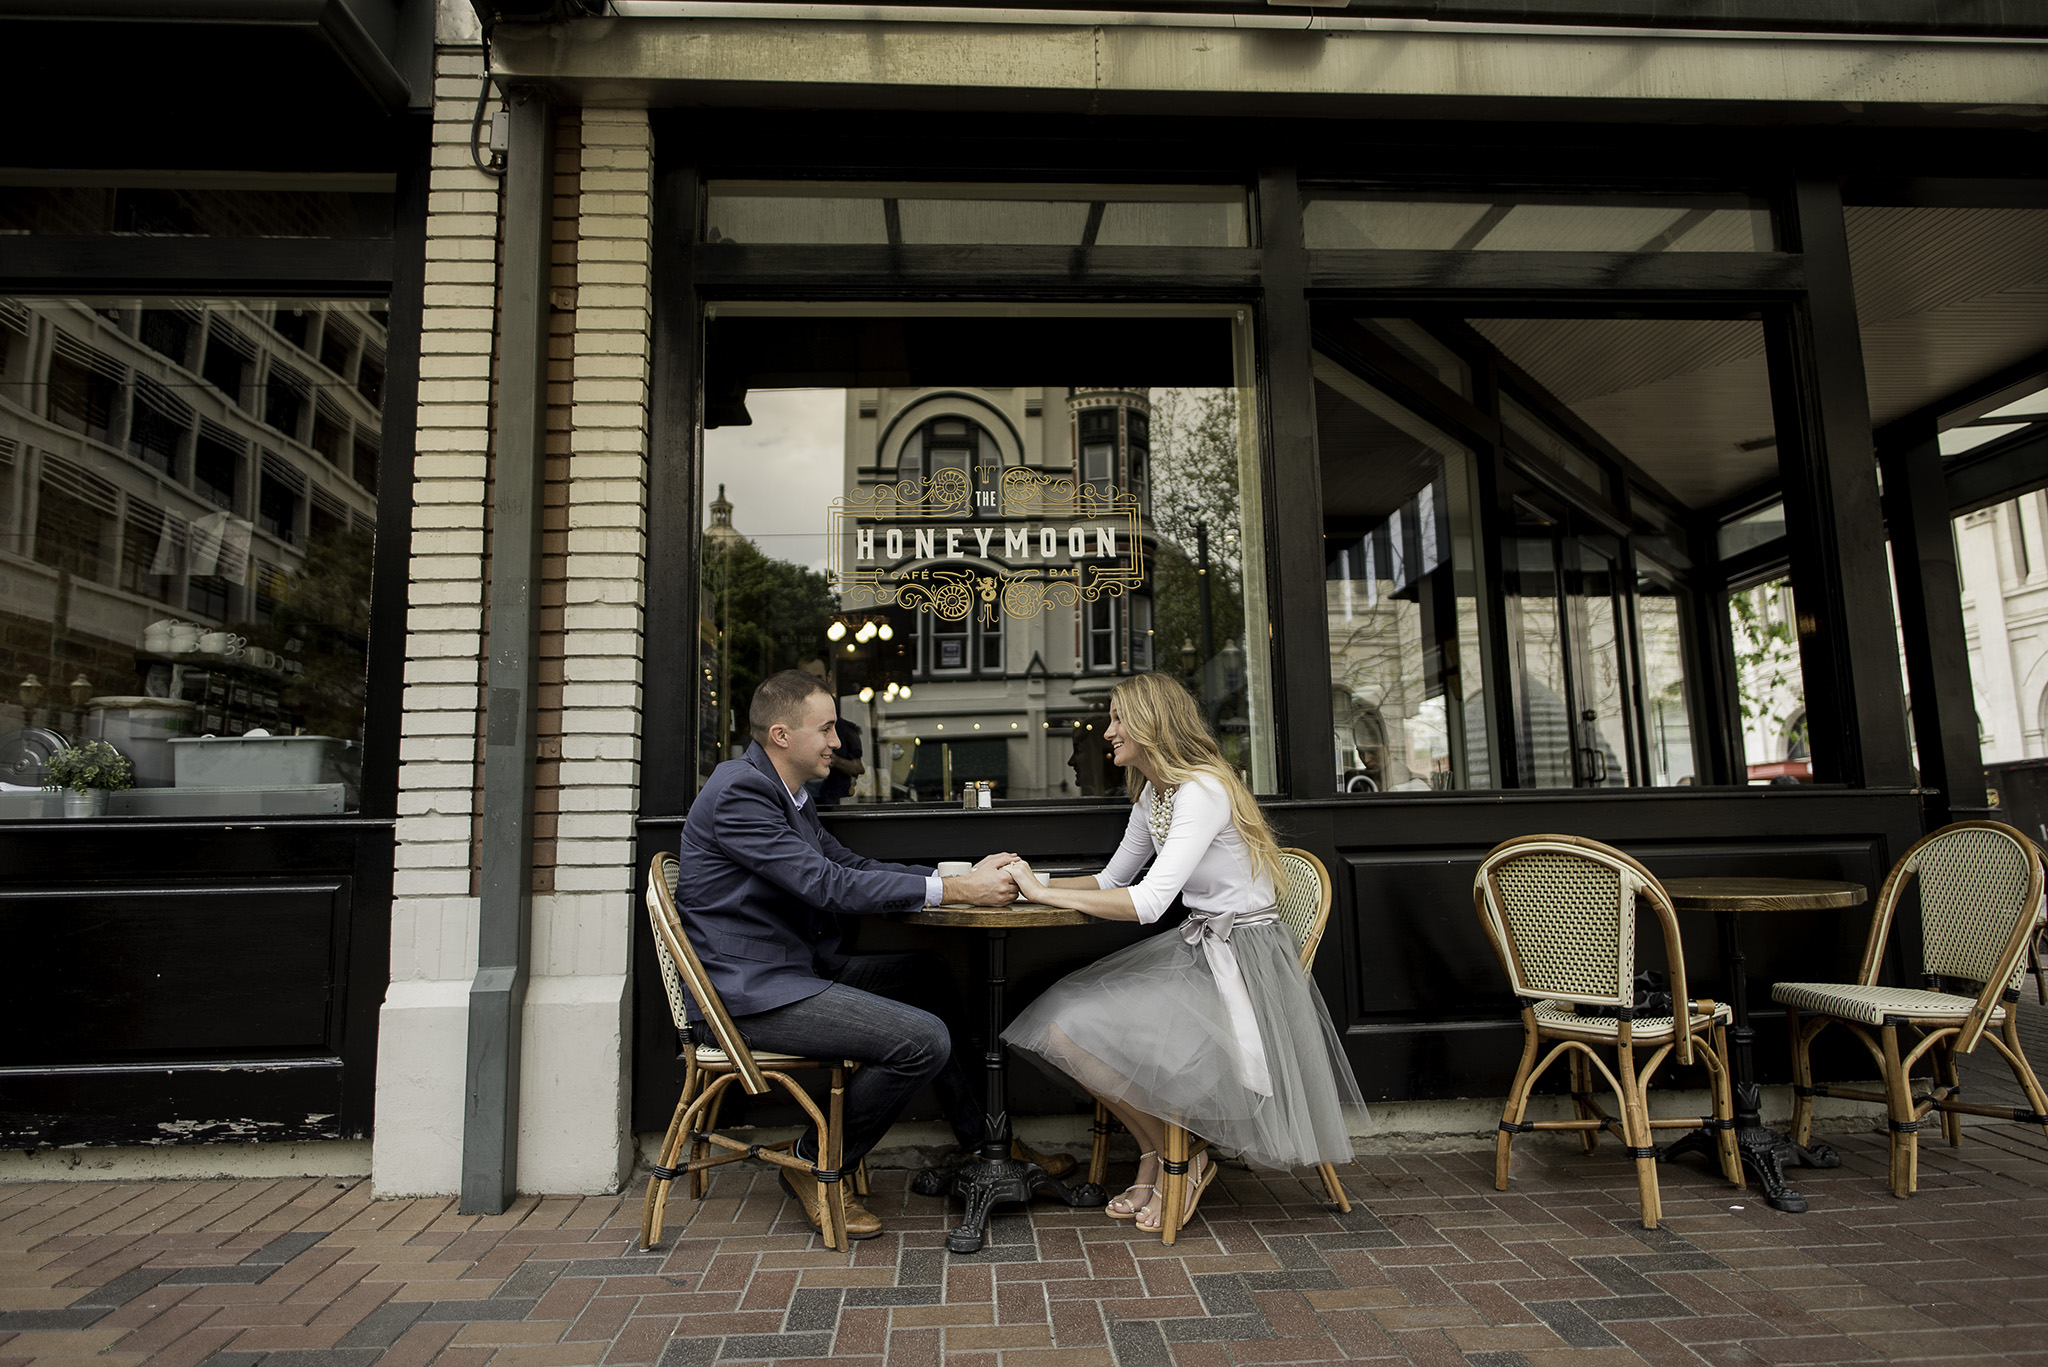 Houston-main-street-Honeymoon-cafe-lifestyle-engagement-session-004.jpg